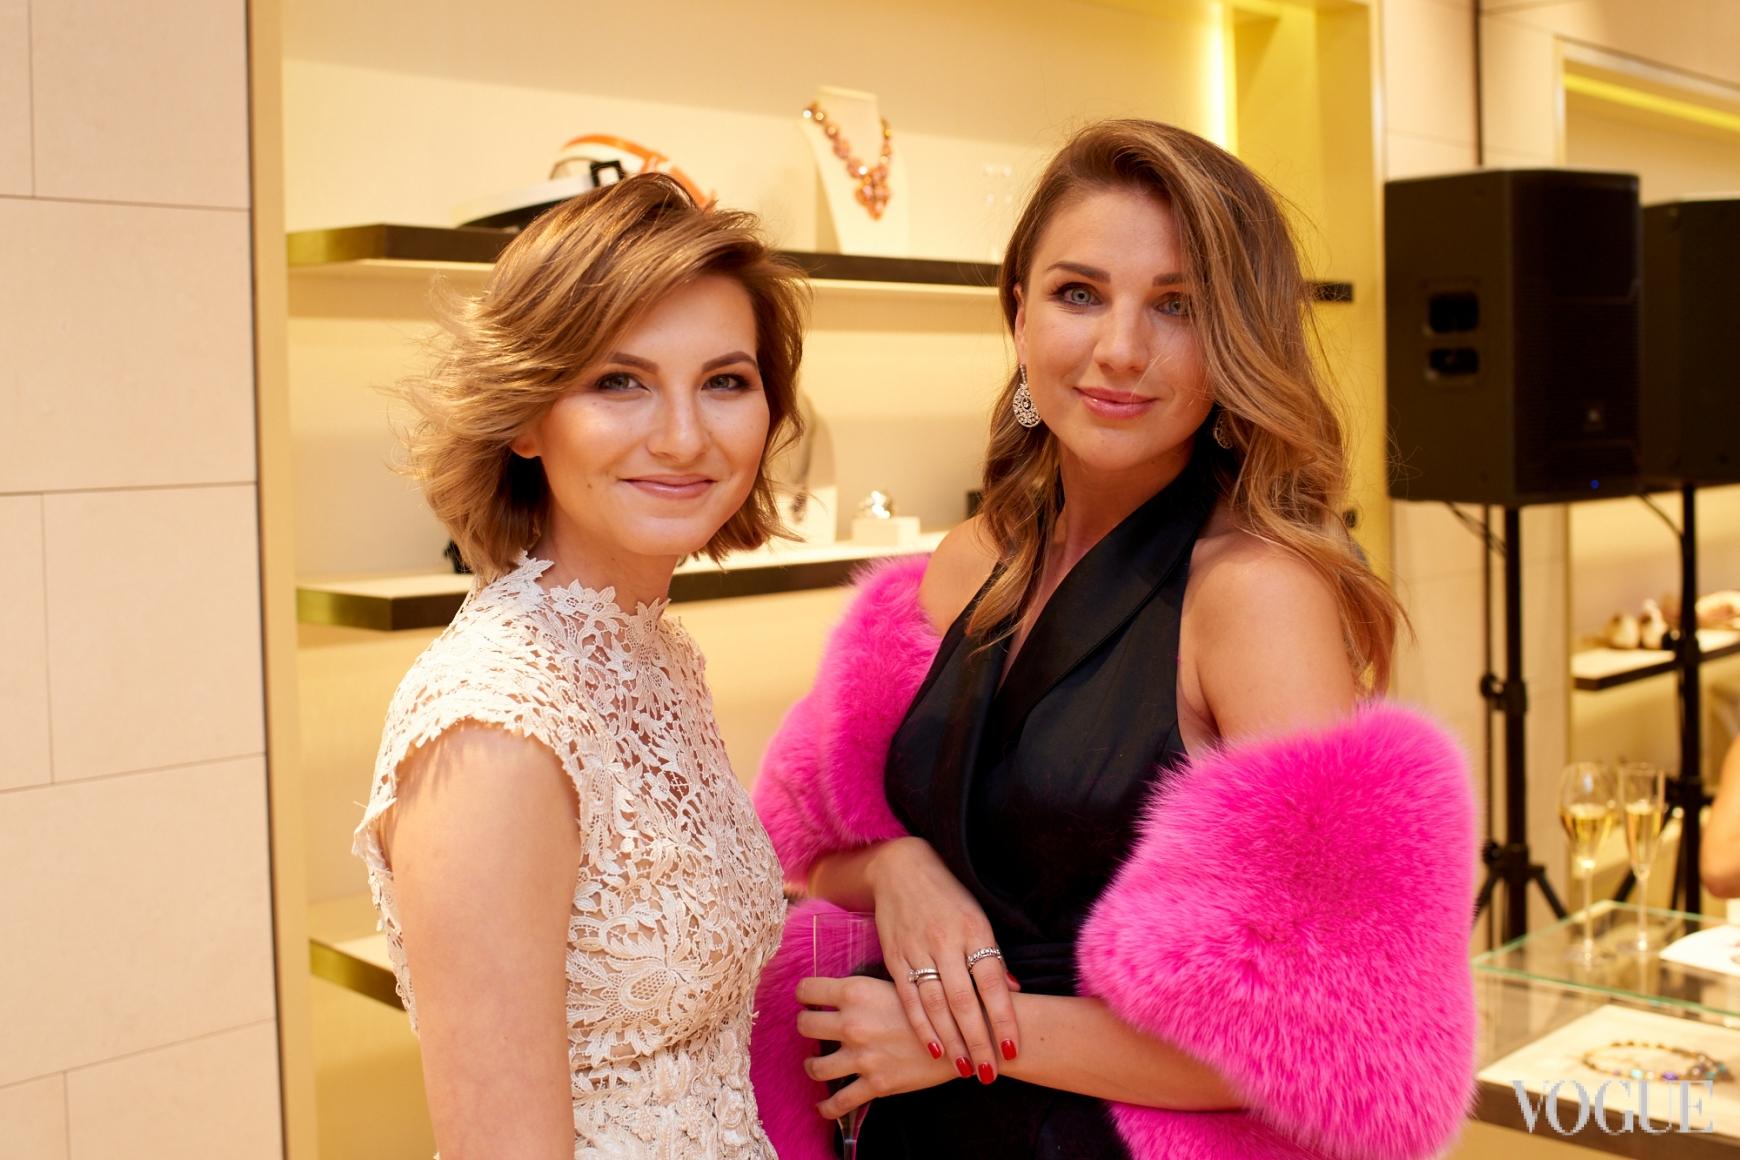 Елизавета Юрушева и Катерина Сильченко